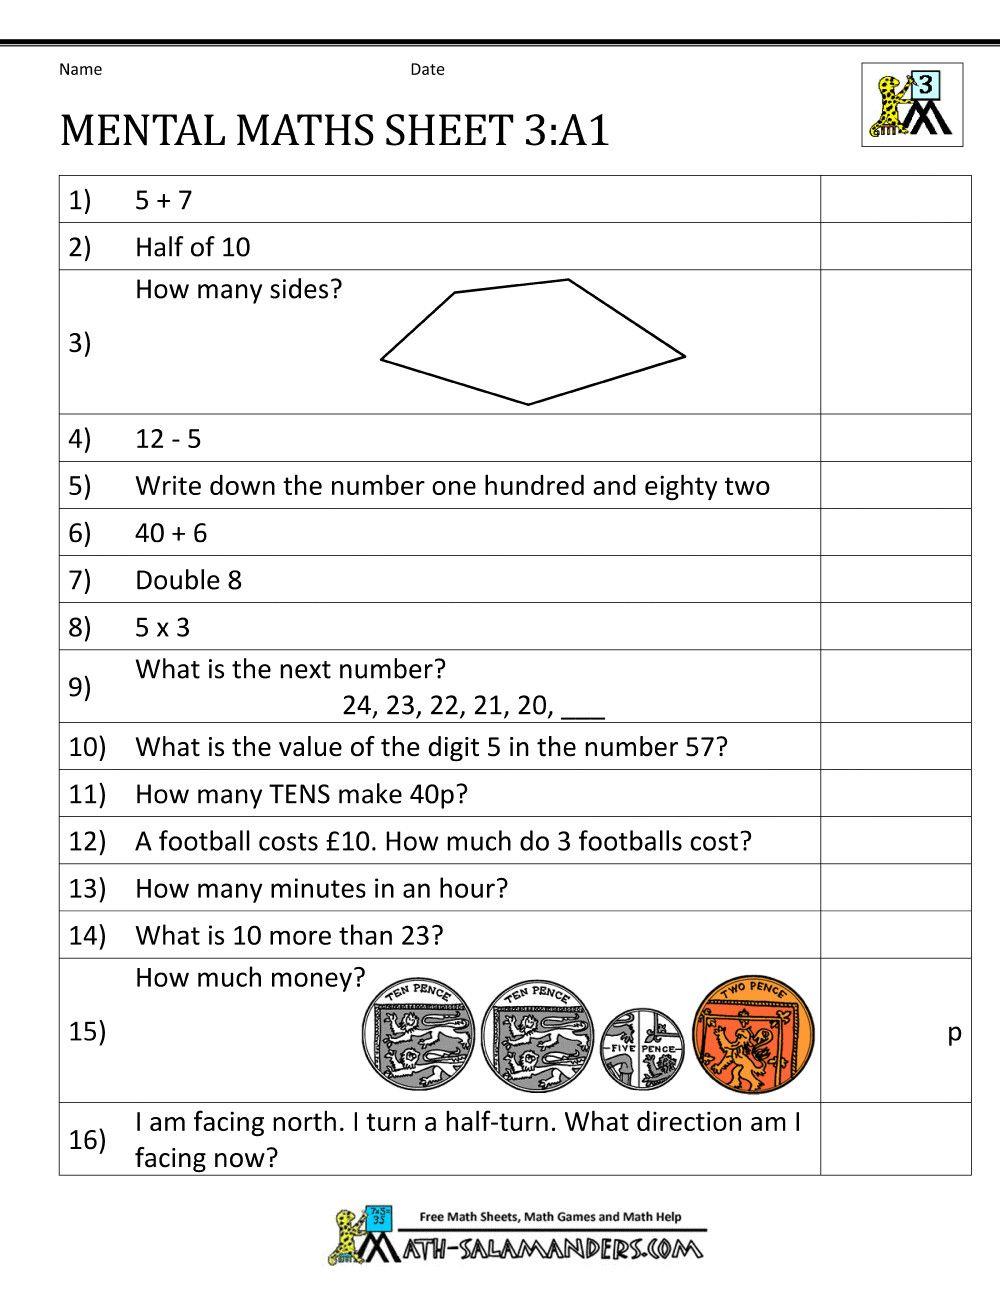 3 Year 4 English Worksheets Free Printable Mental Pin On Cake Recipes In 2020 Mental Maths Worksheets Mental Math Math Worksheets